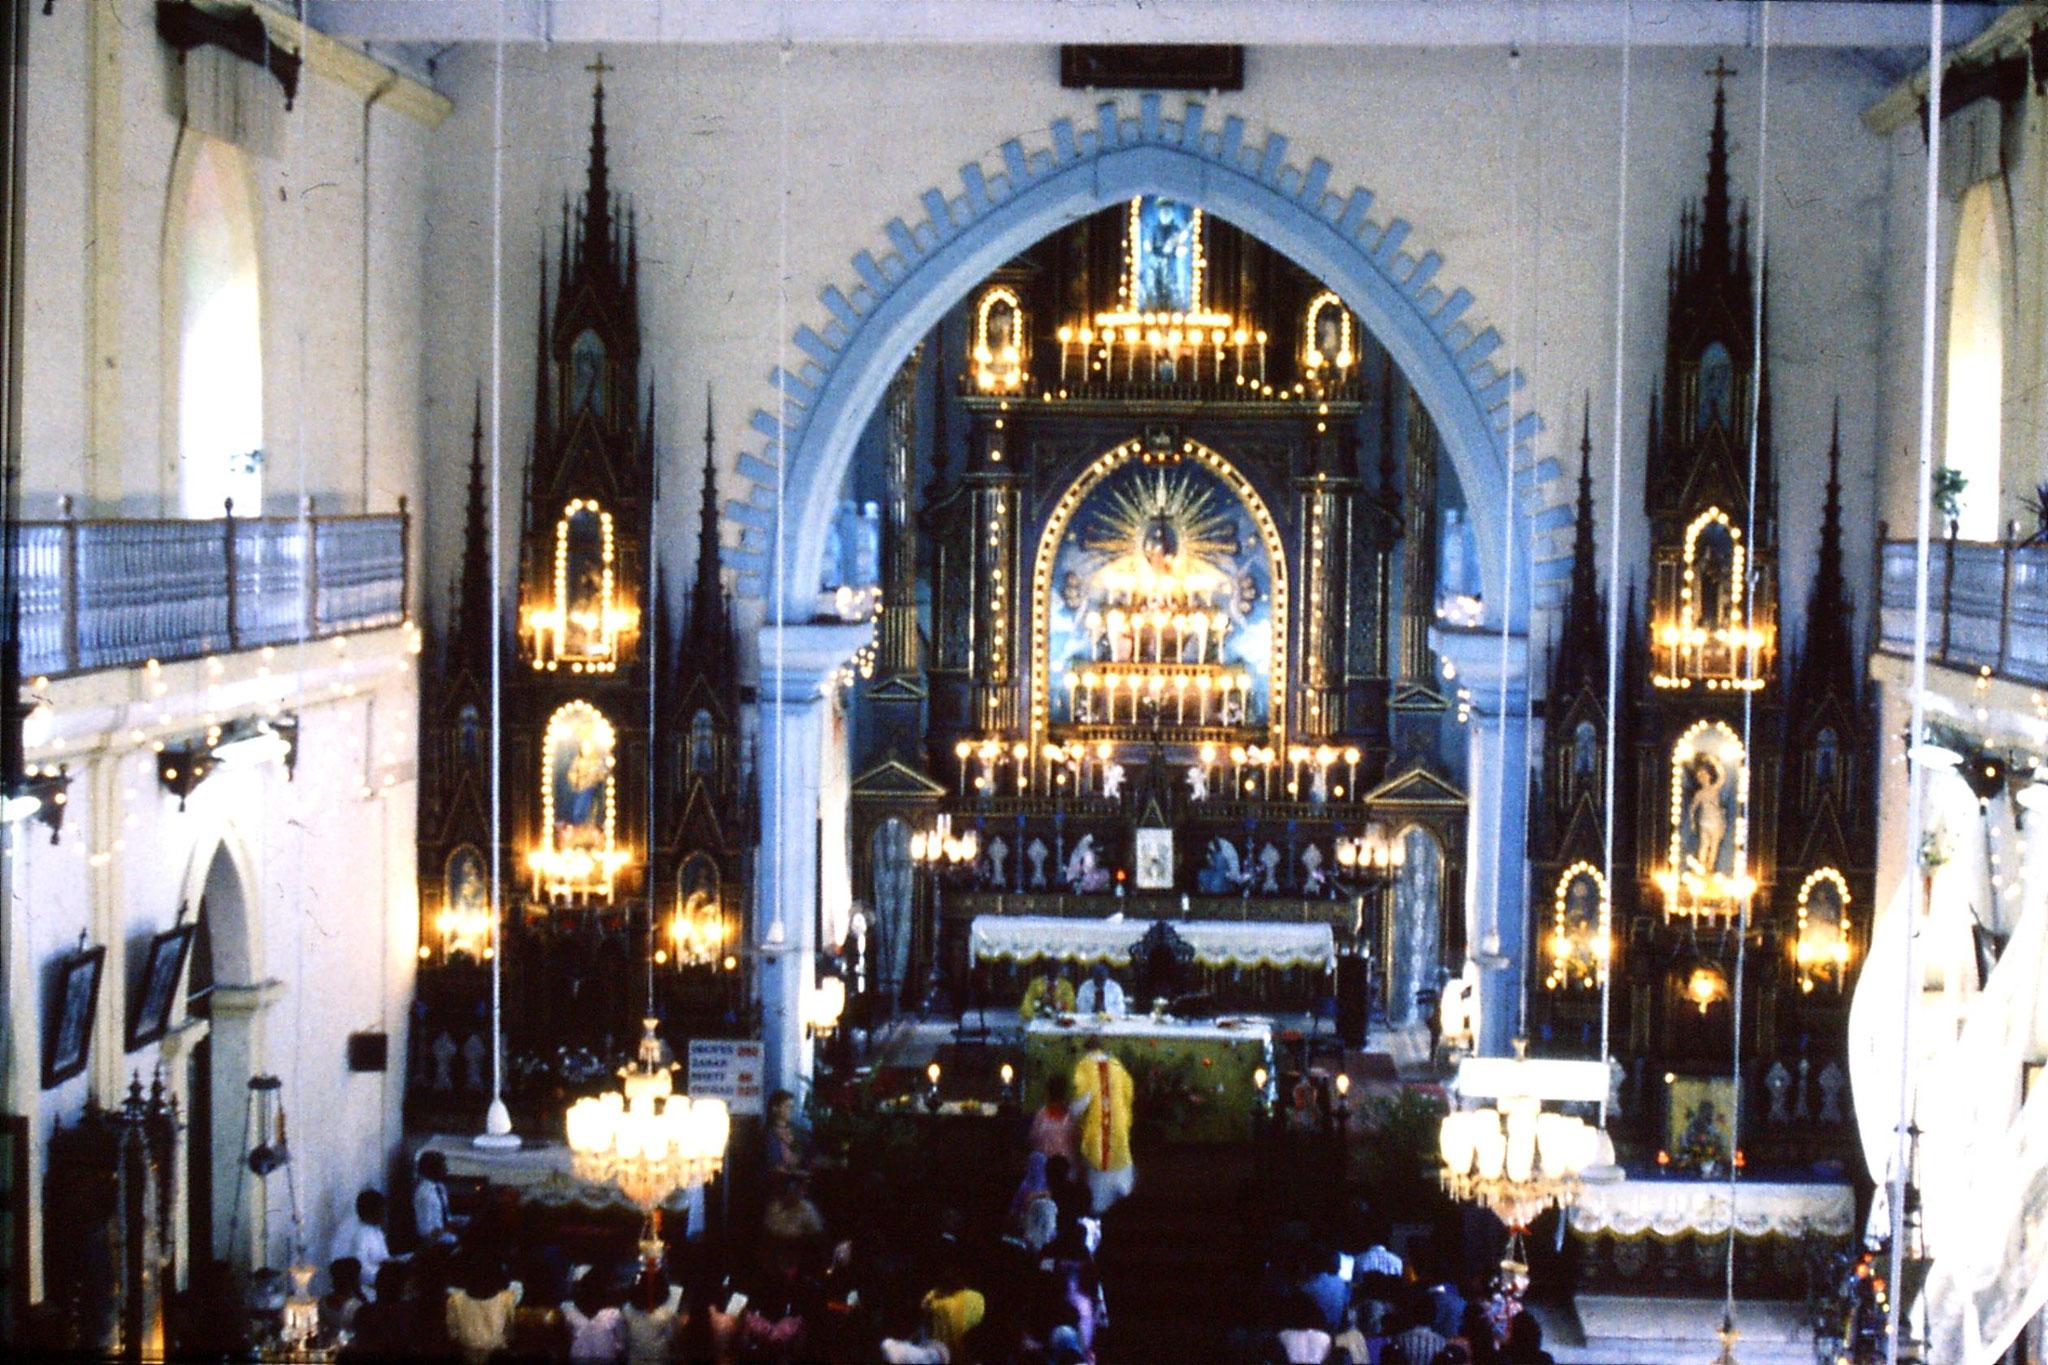 31/12/1989: 9: Siolim church and 10.30 mass